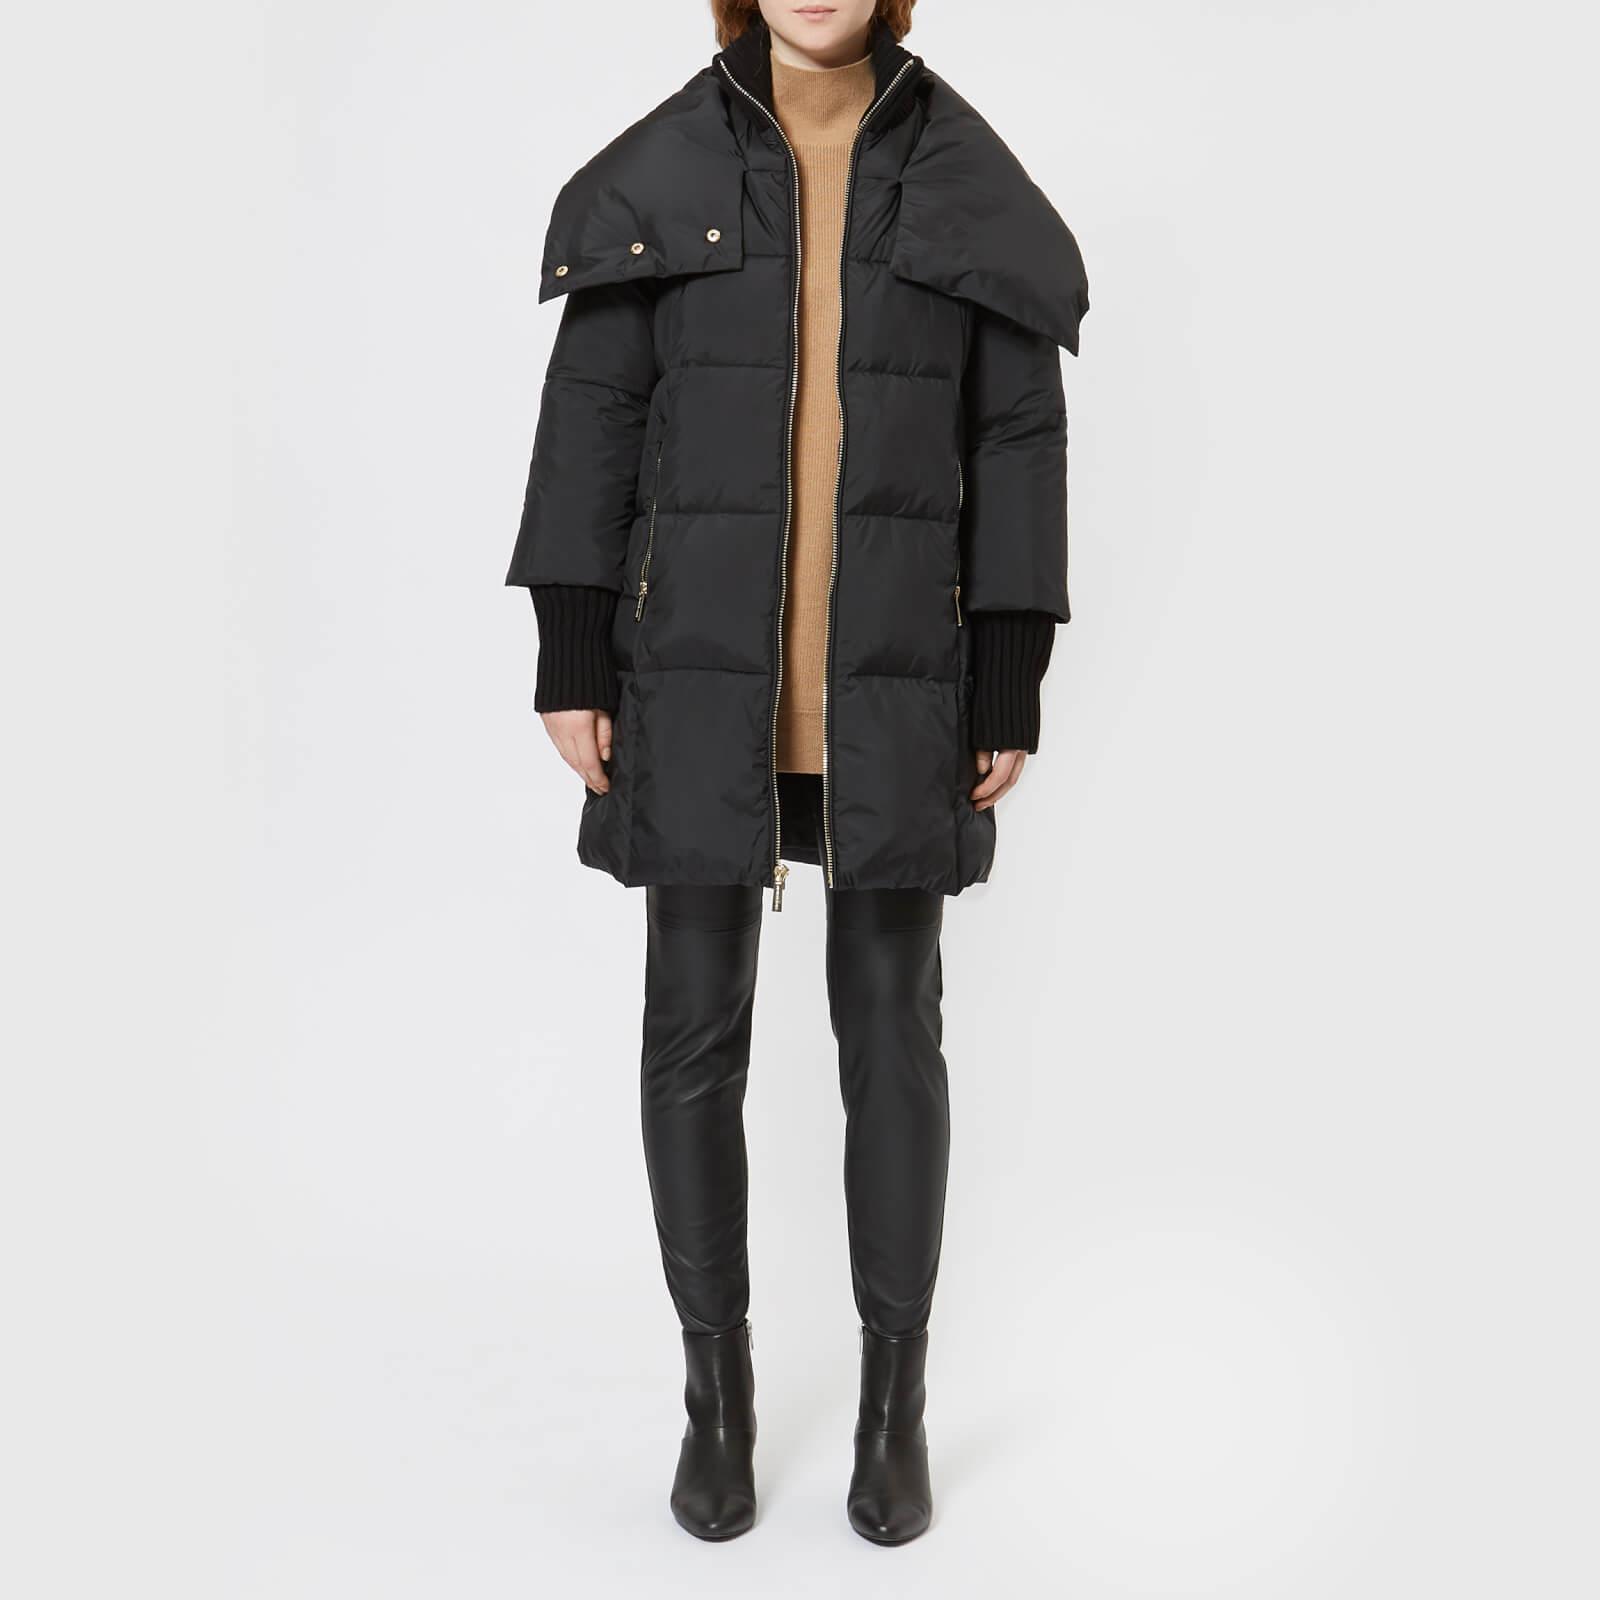 8f65c9a3e MICHAEL Michael Kors Black Fashion Heavy Down Puffa Jacket